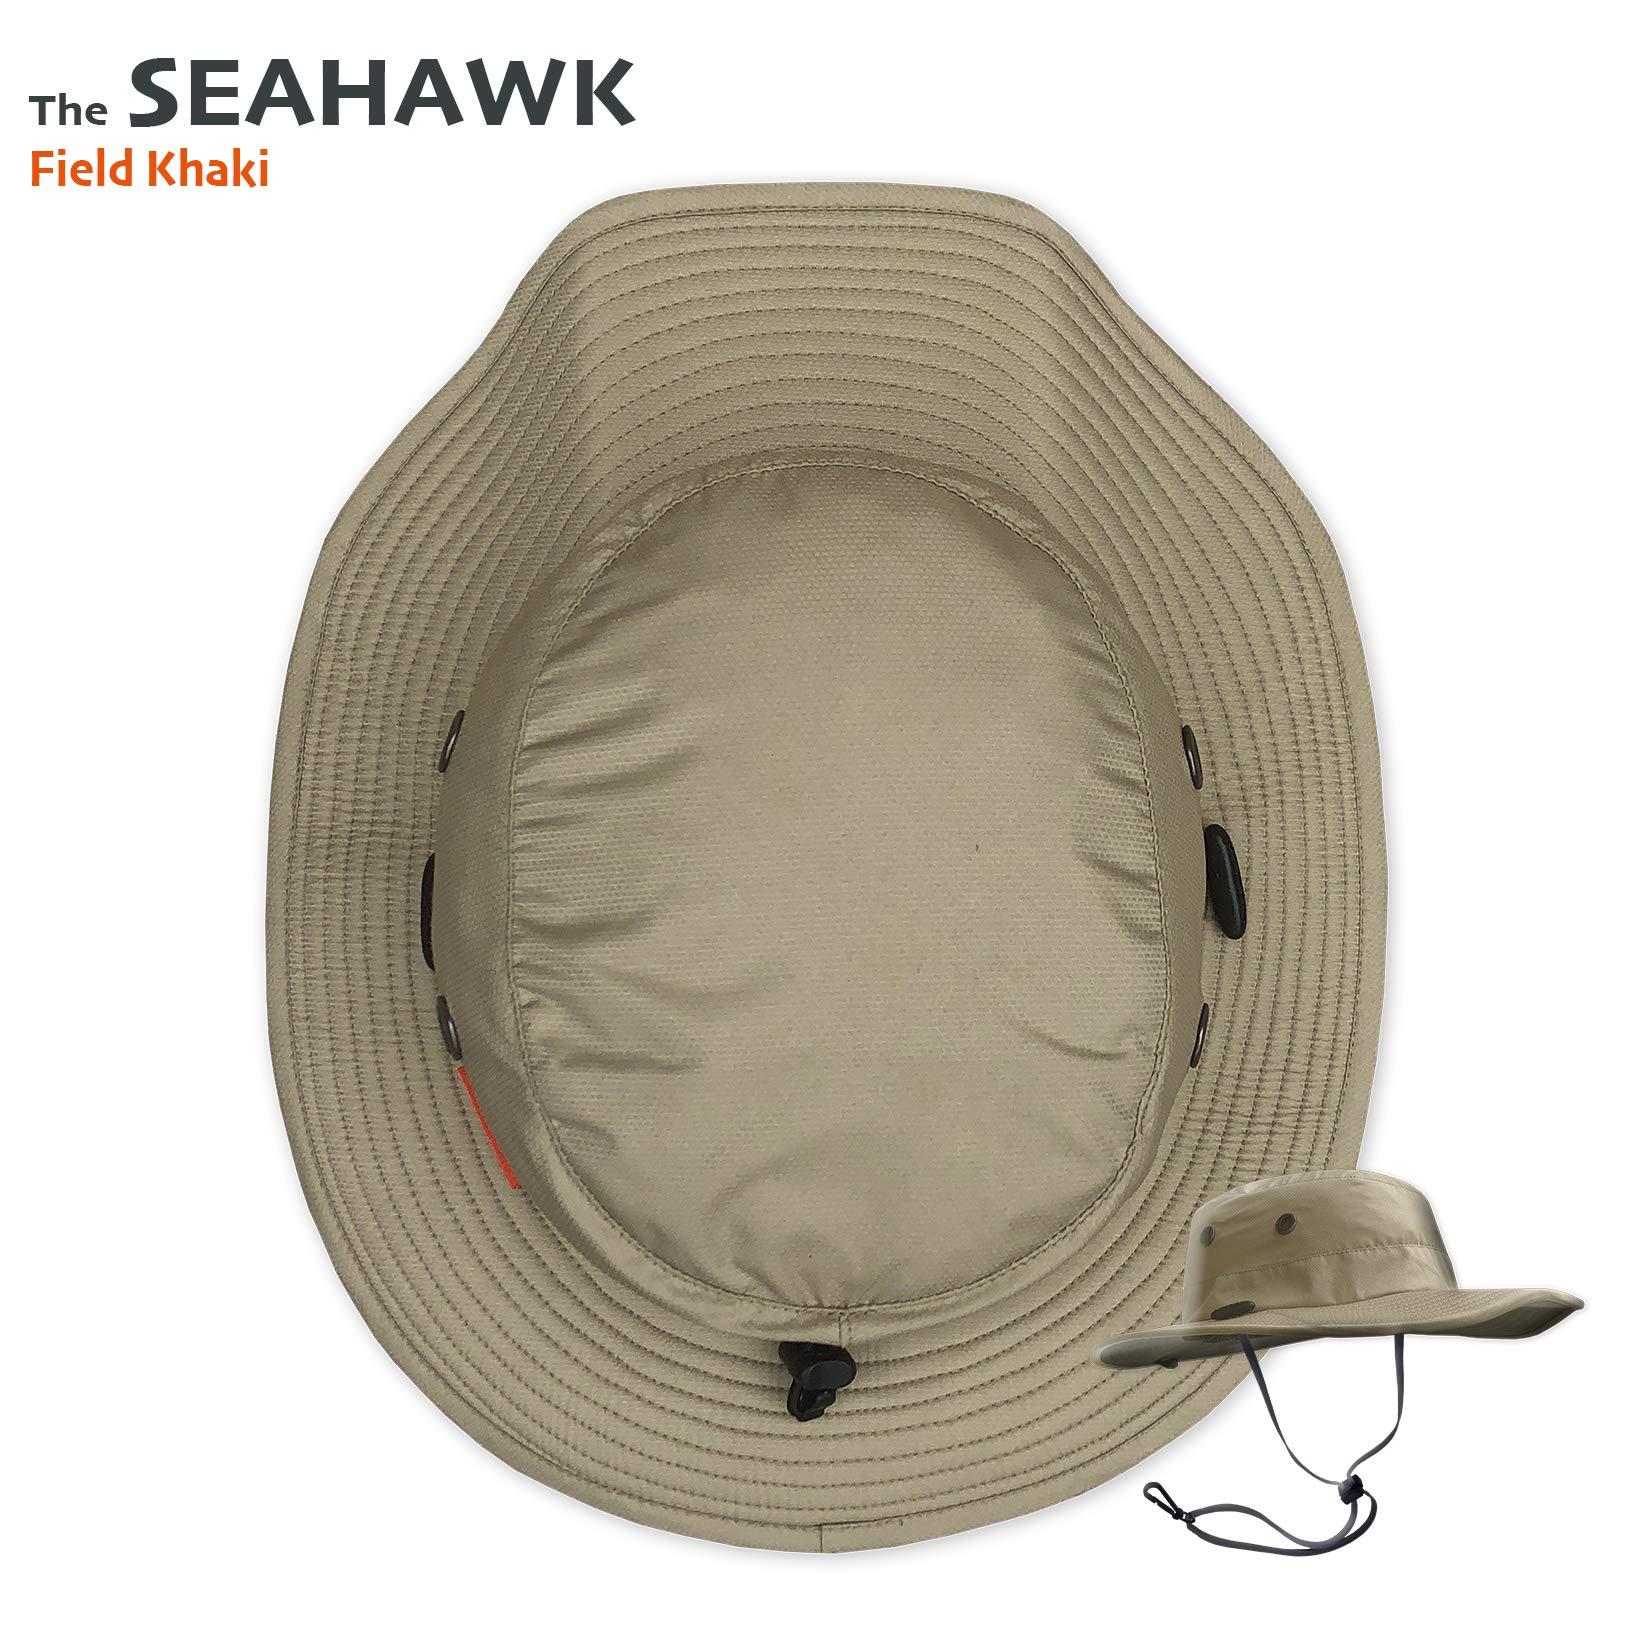 Seahawk (S/M, Field Khaki) by Shelta (Image #2)